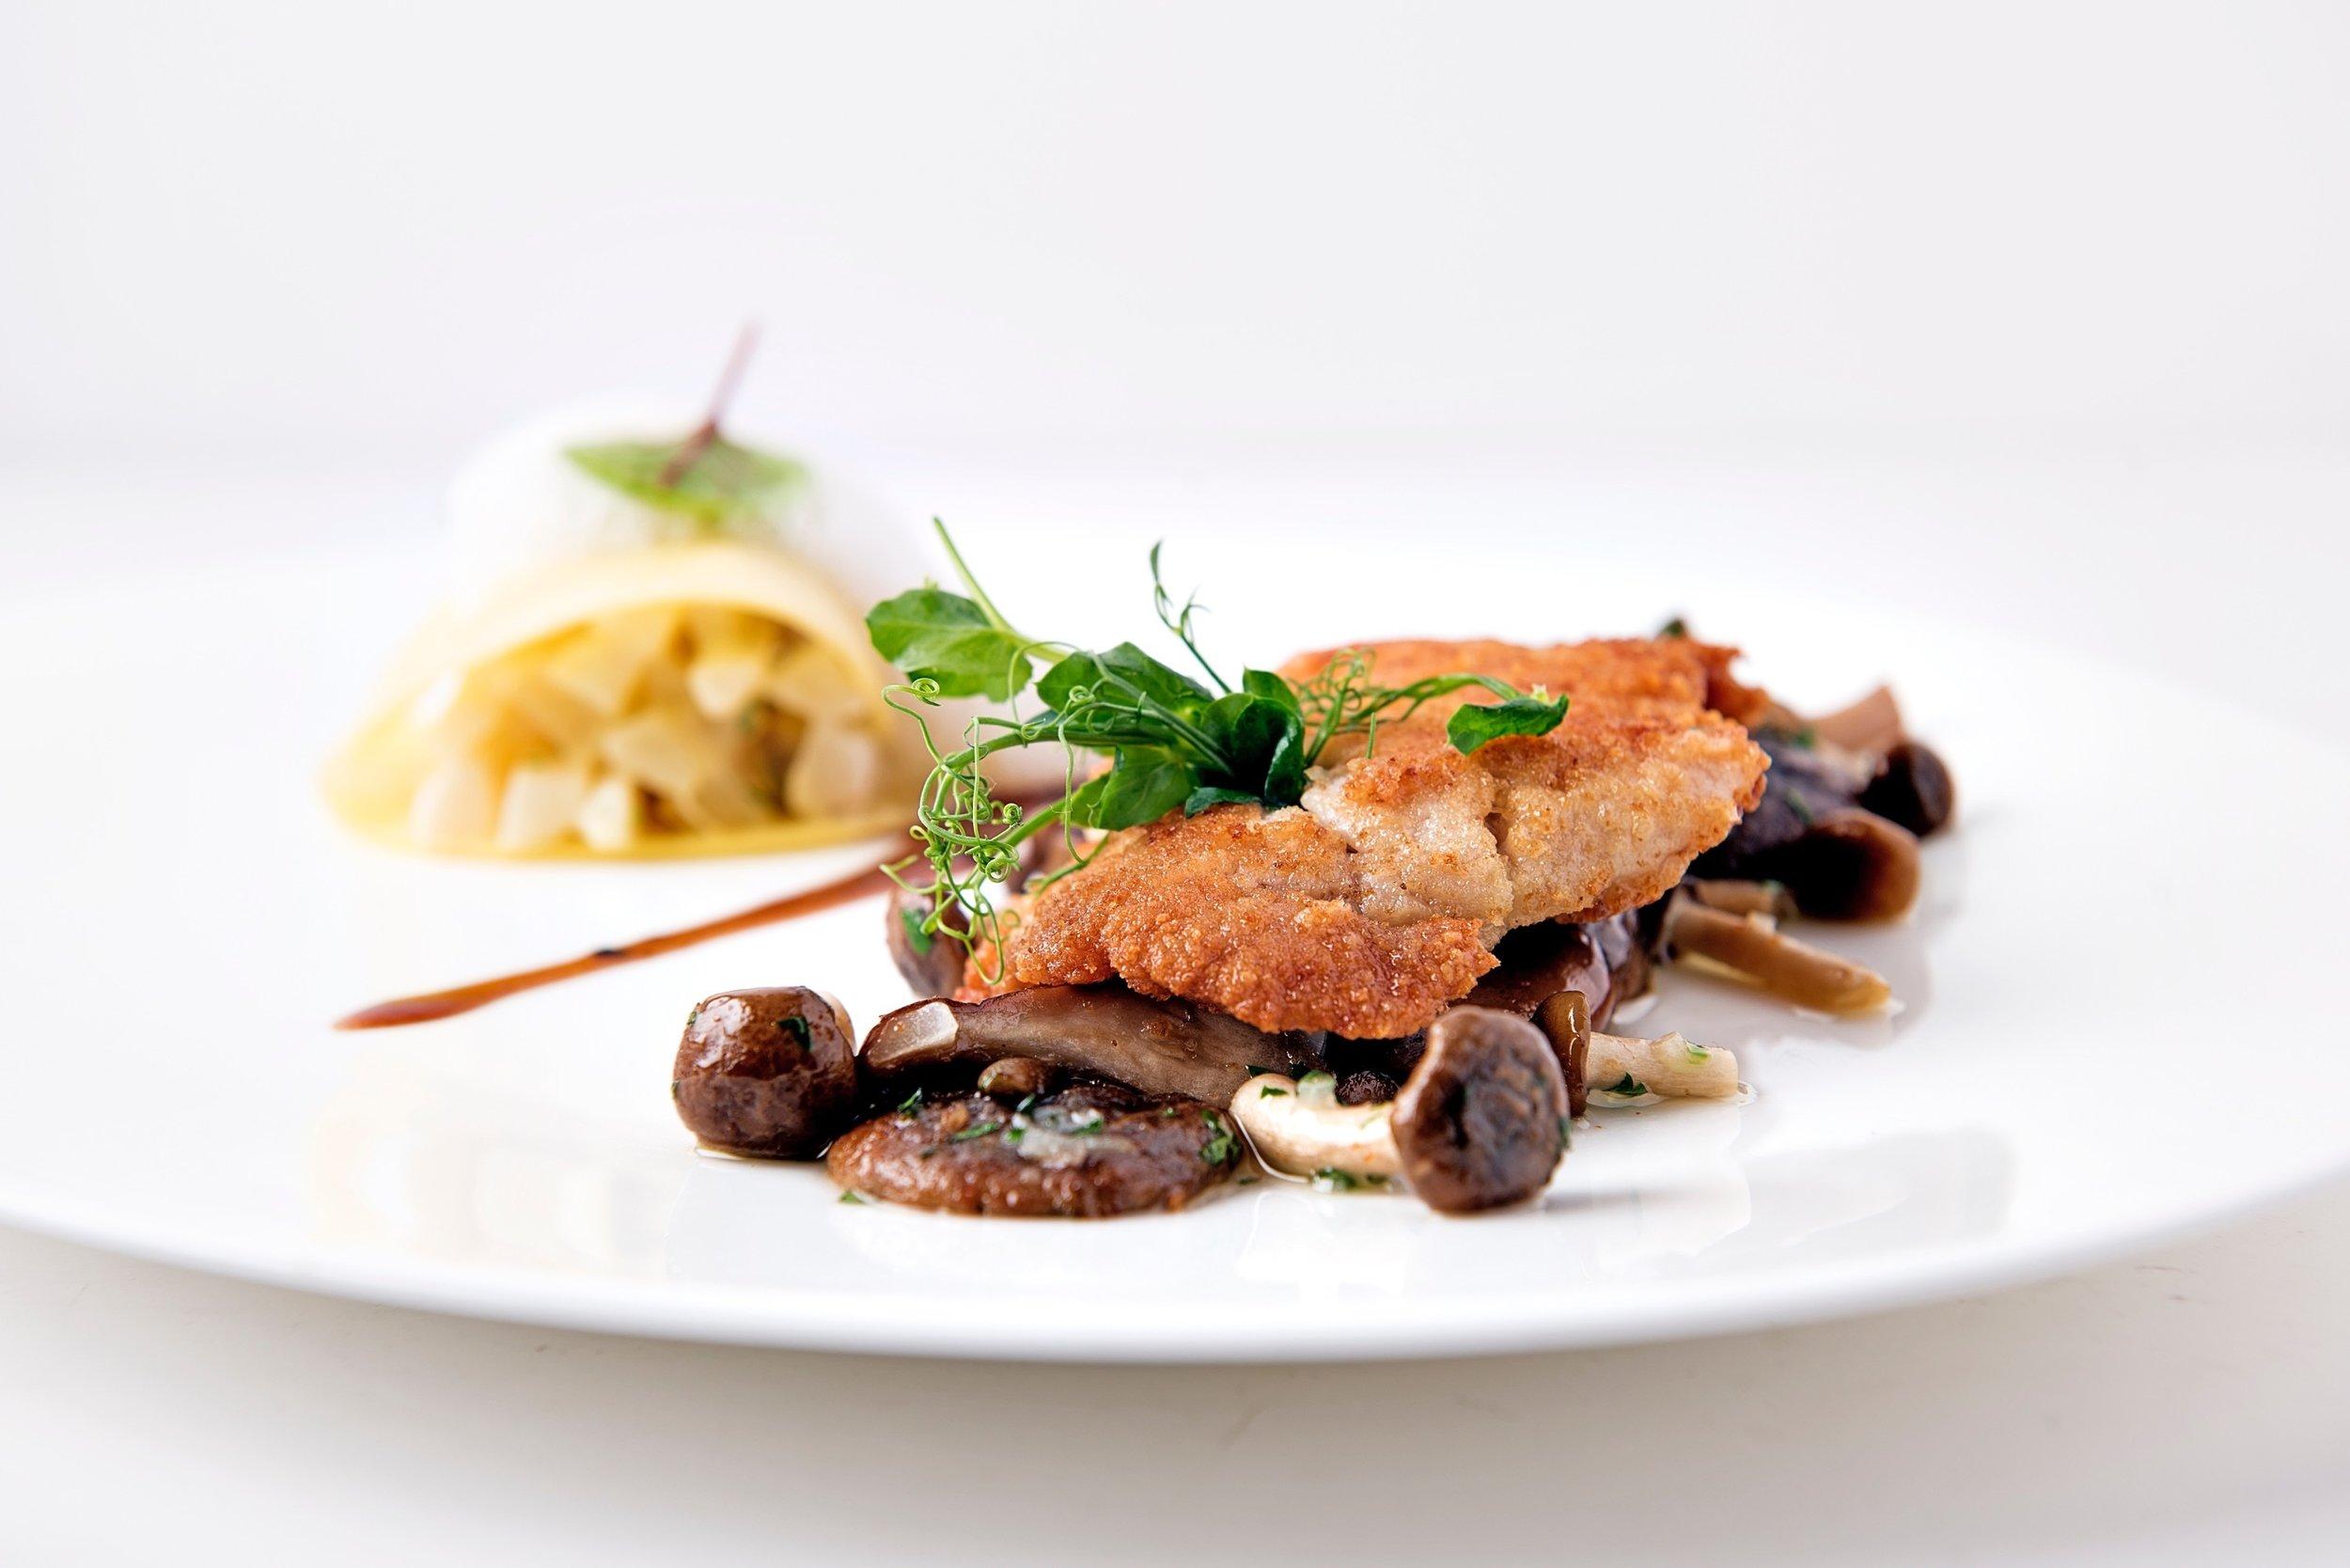 10 michelin restaurant the glorious antwerpen tablefever bart albrecht.jpg